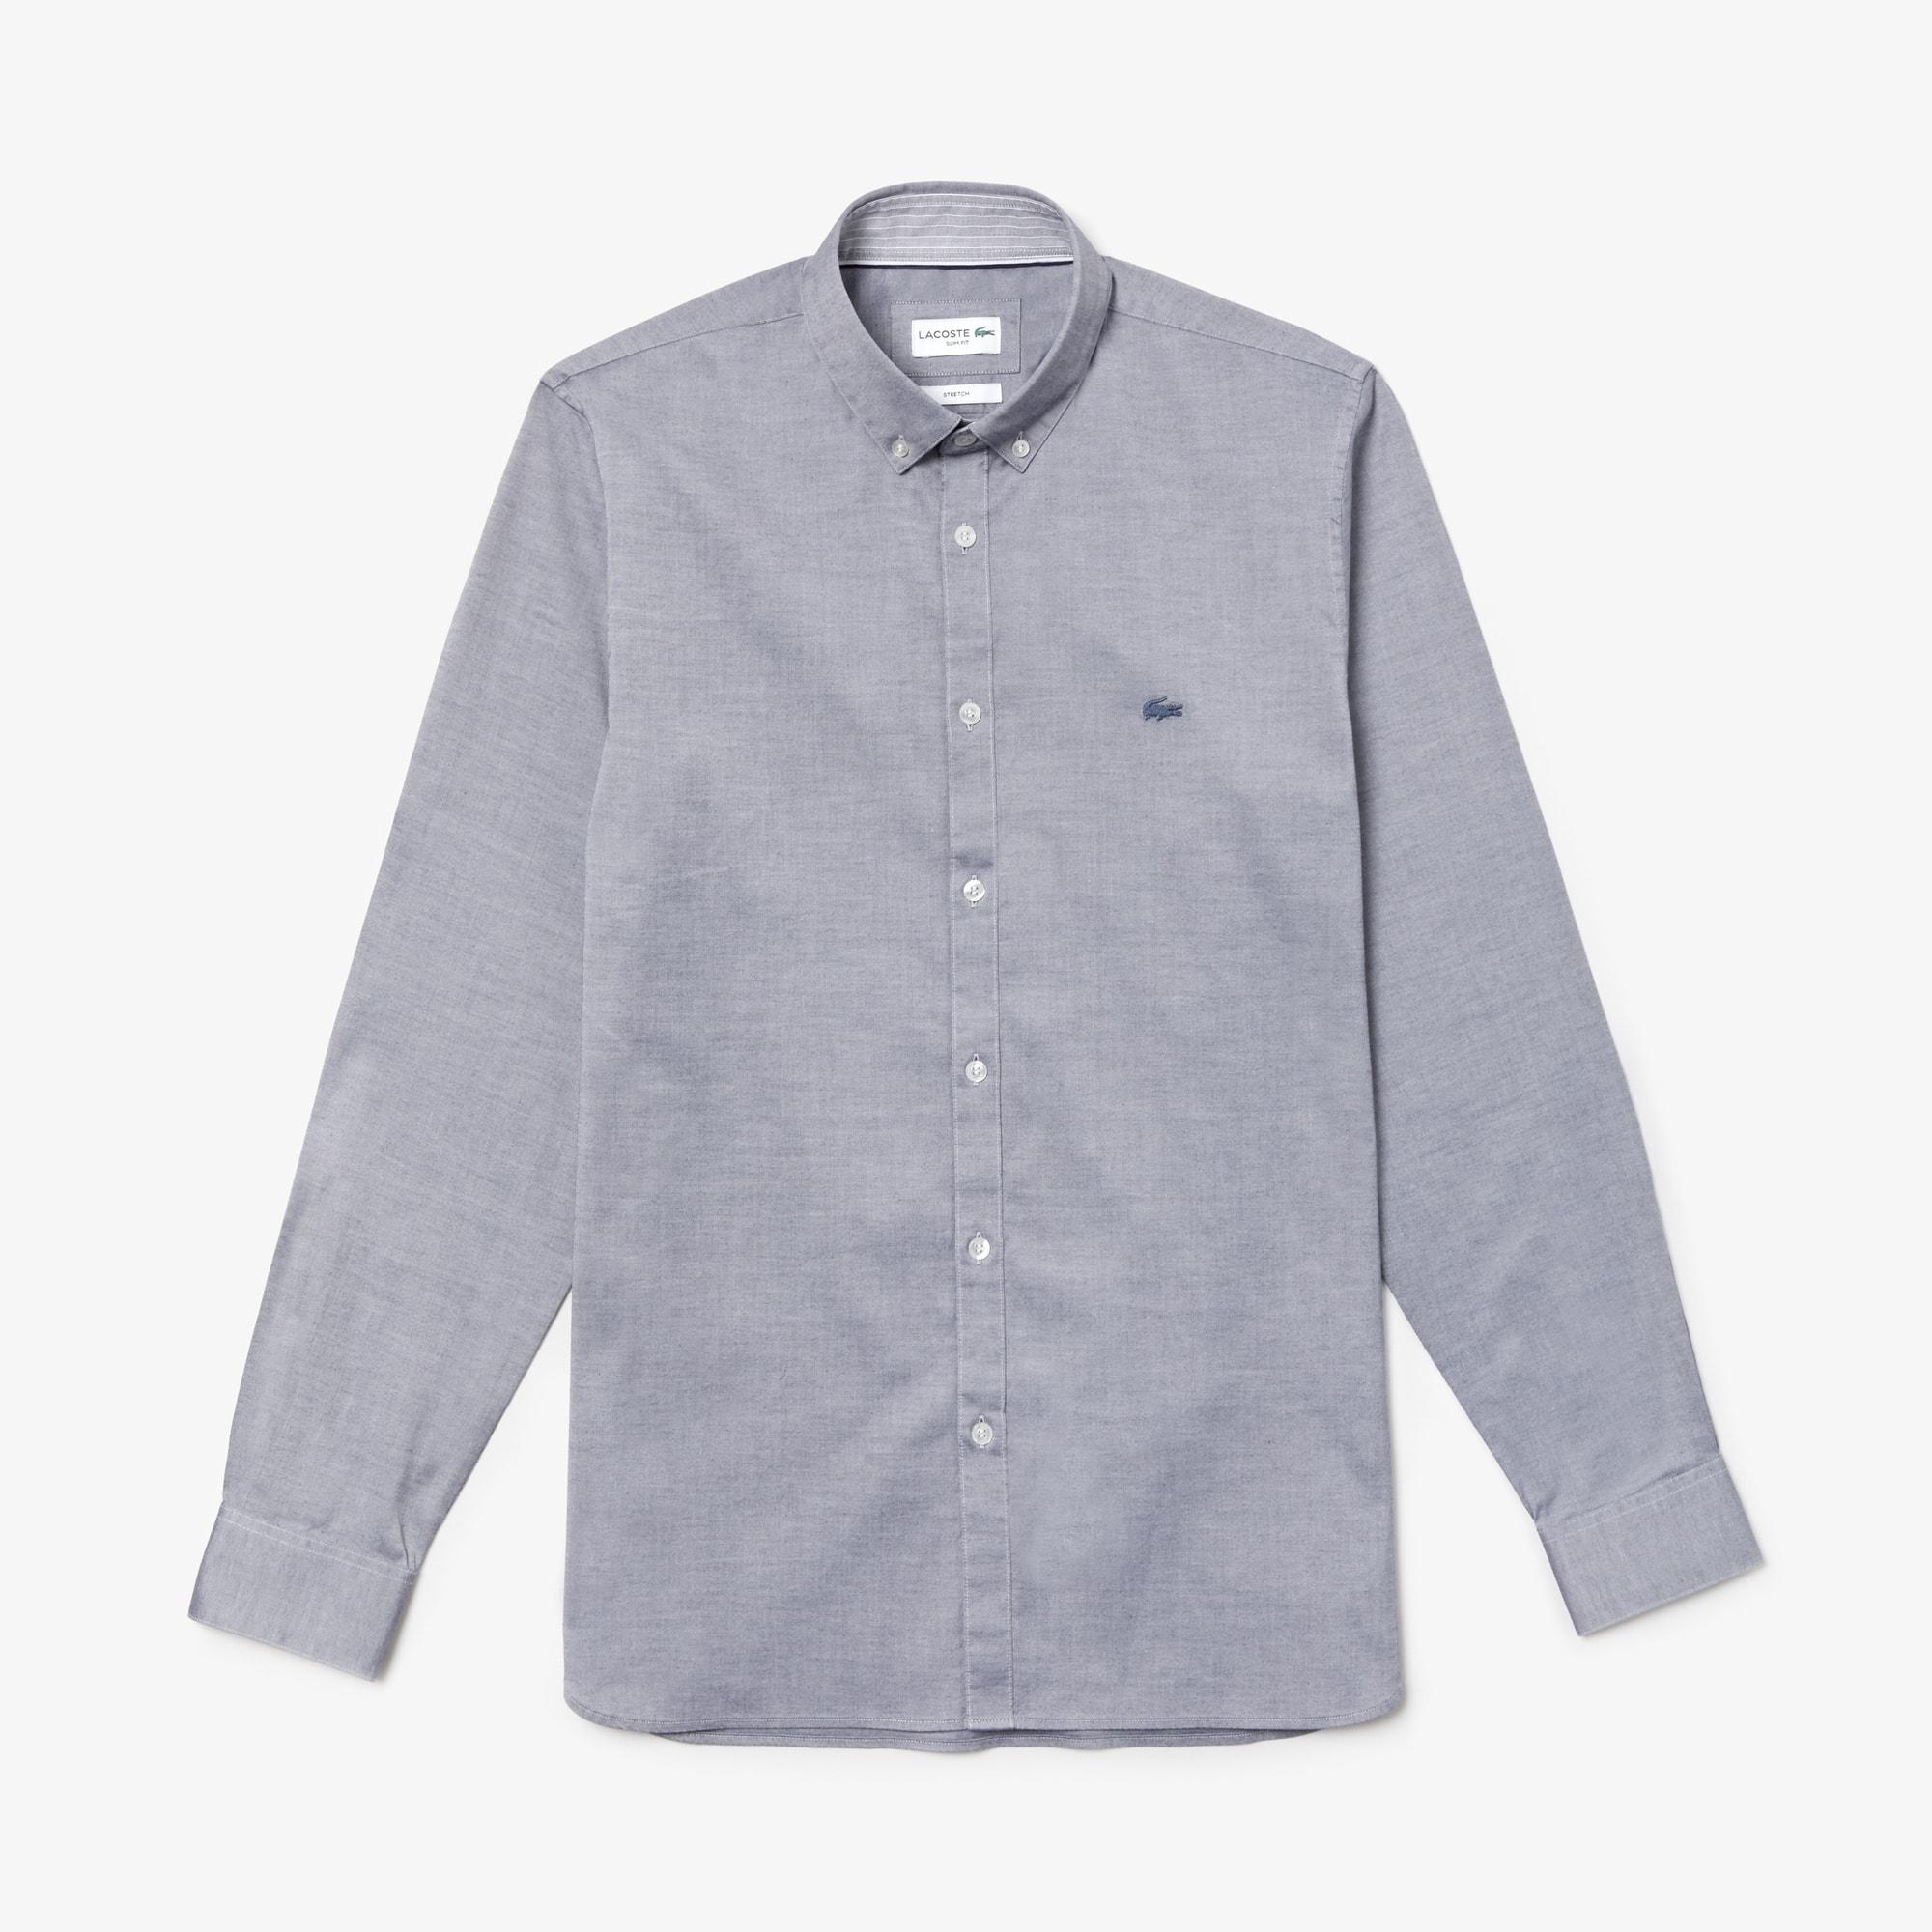 Camicia slim fit in cotone pinpoint stretch tinta unita